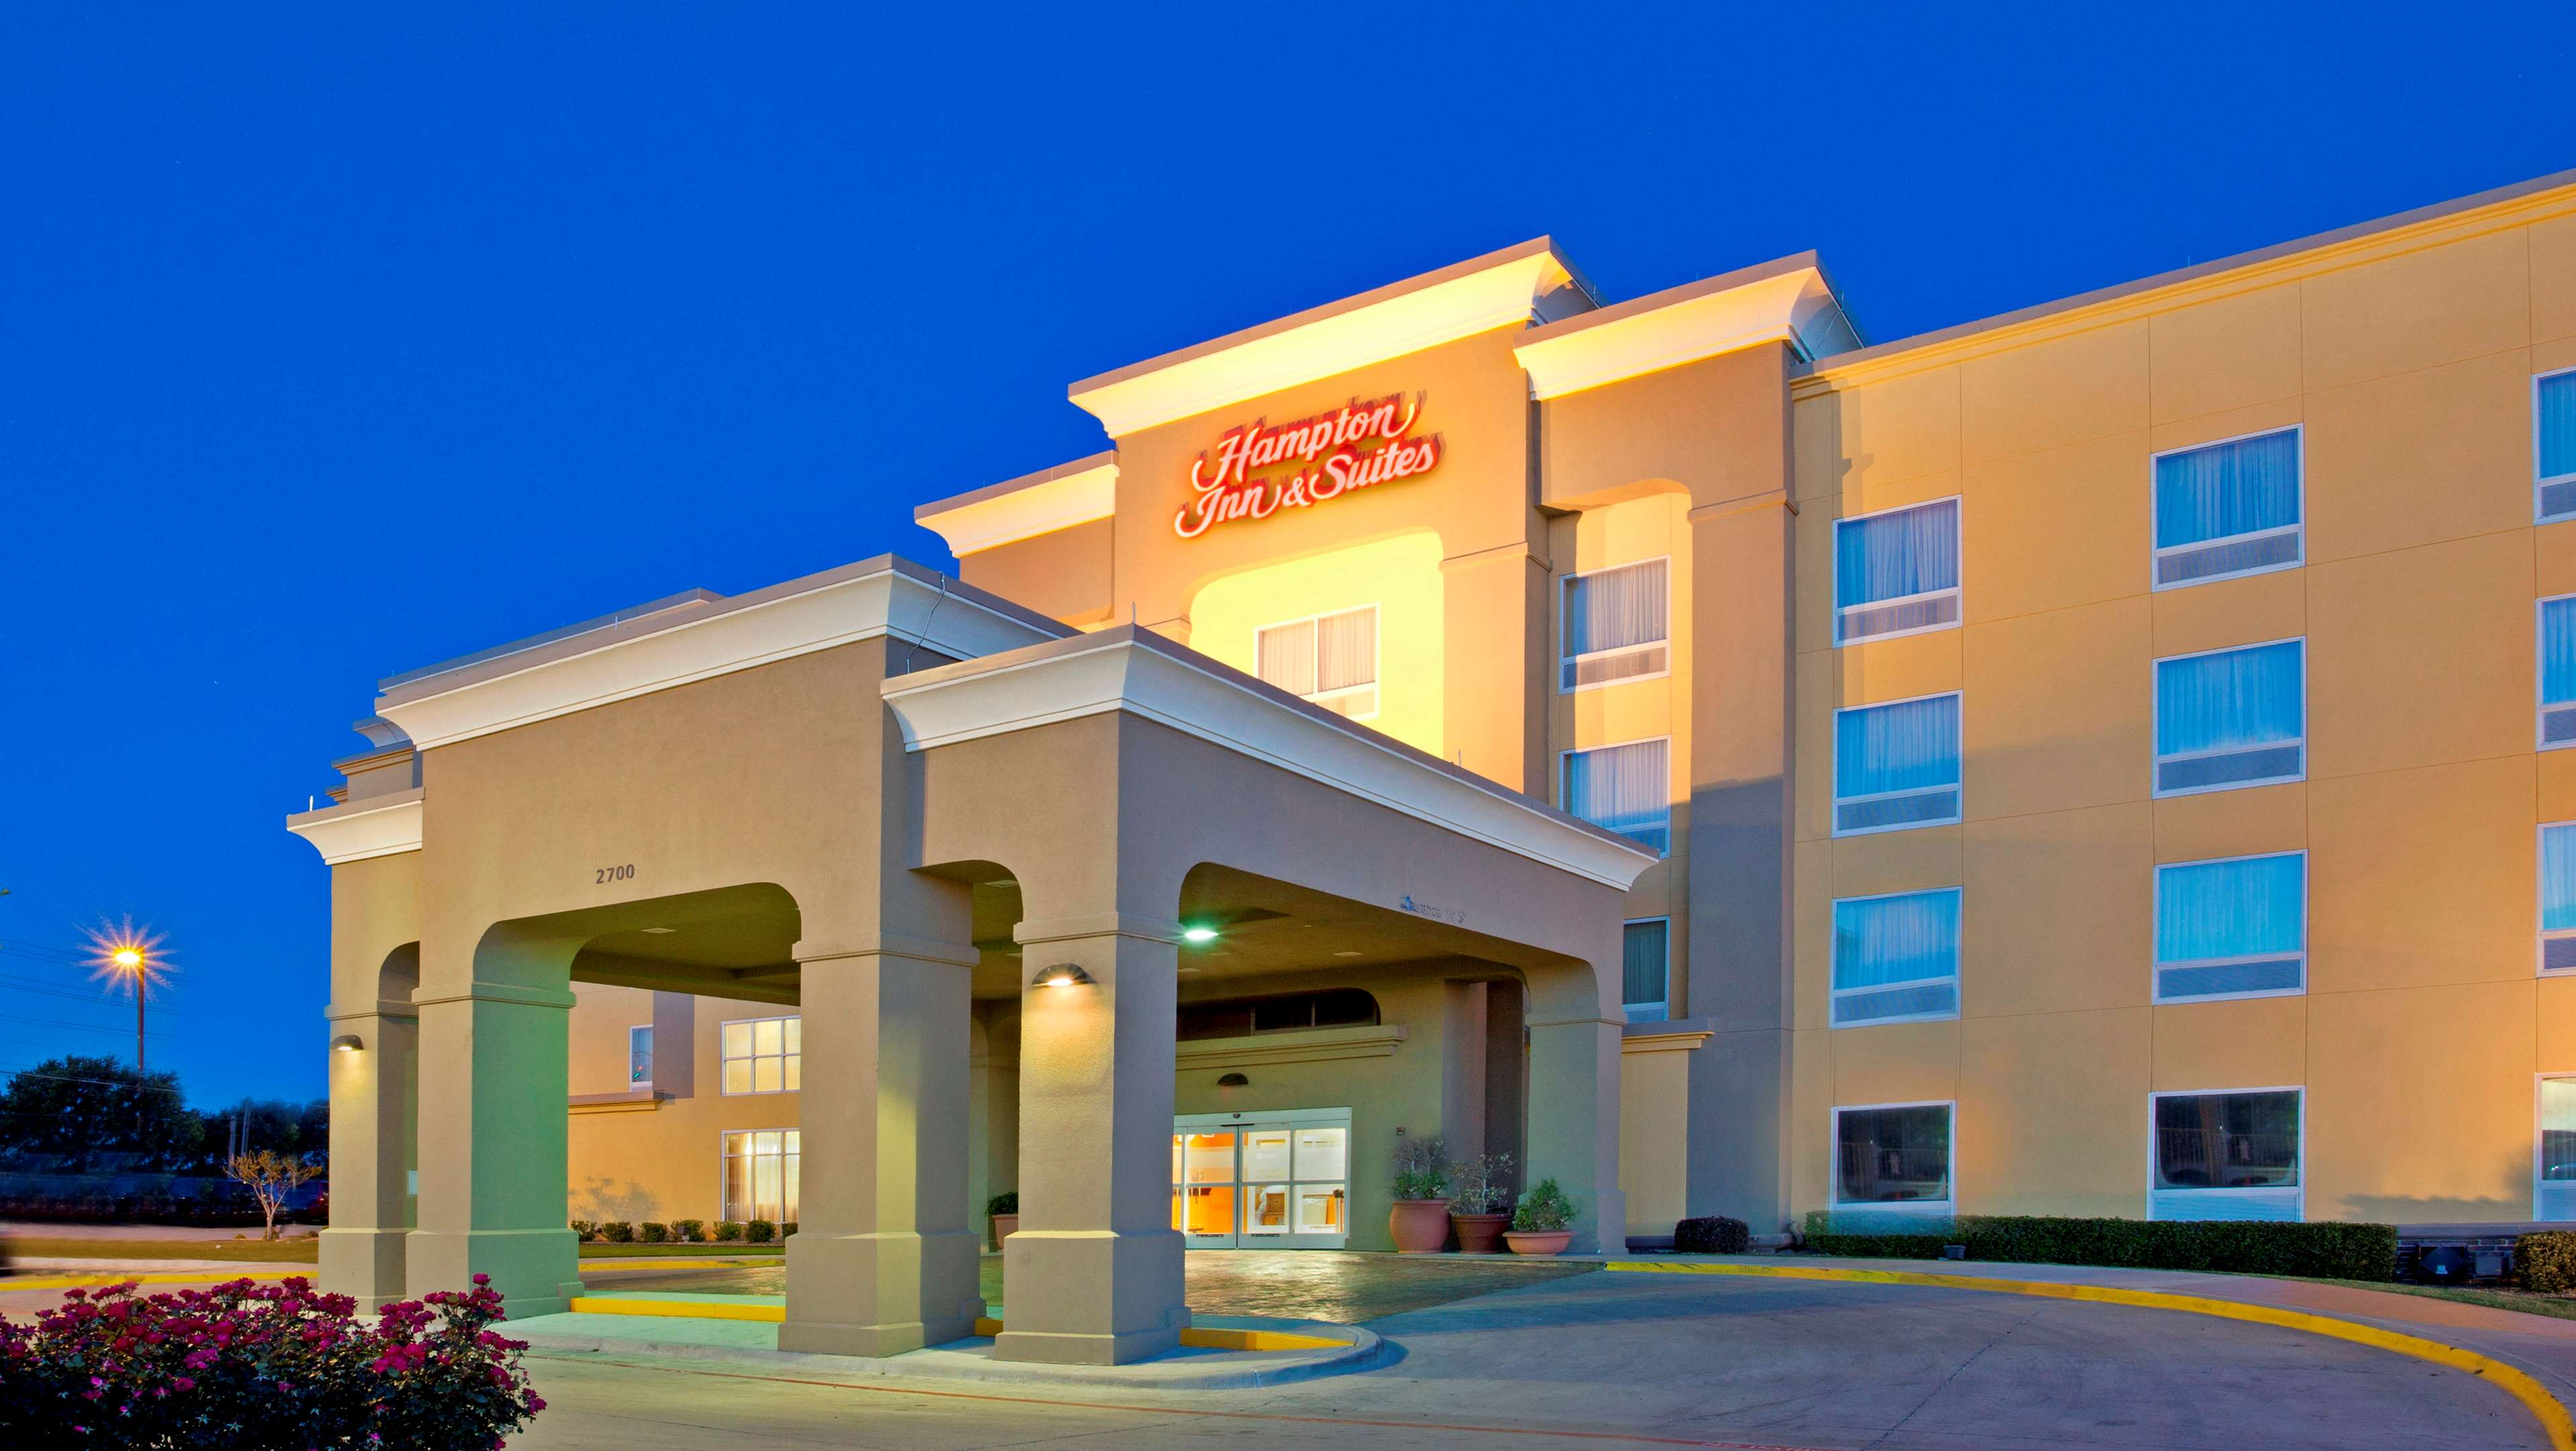 Hampton Inn & Suites Fort Worth-West-I-30 image 0